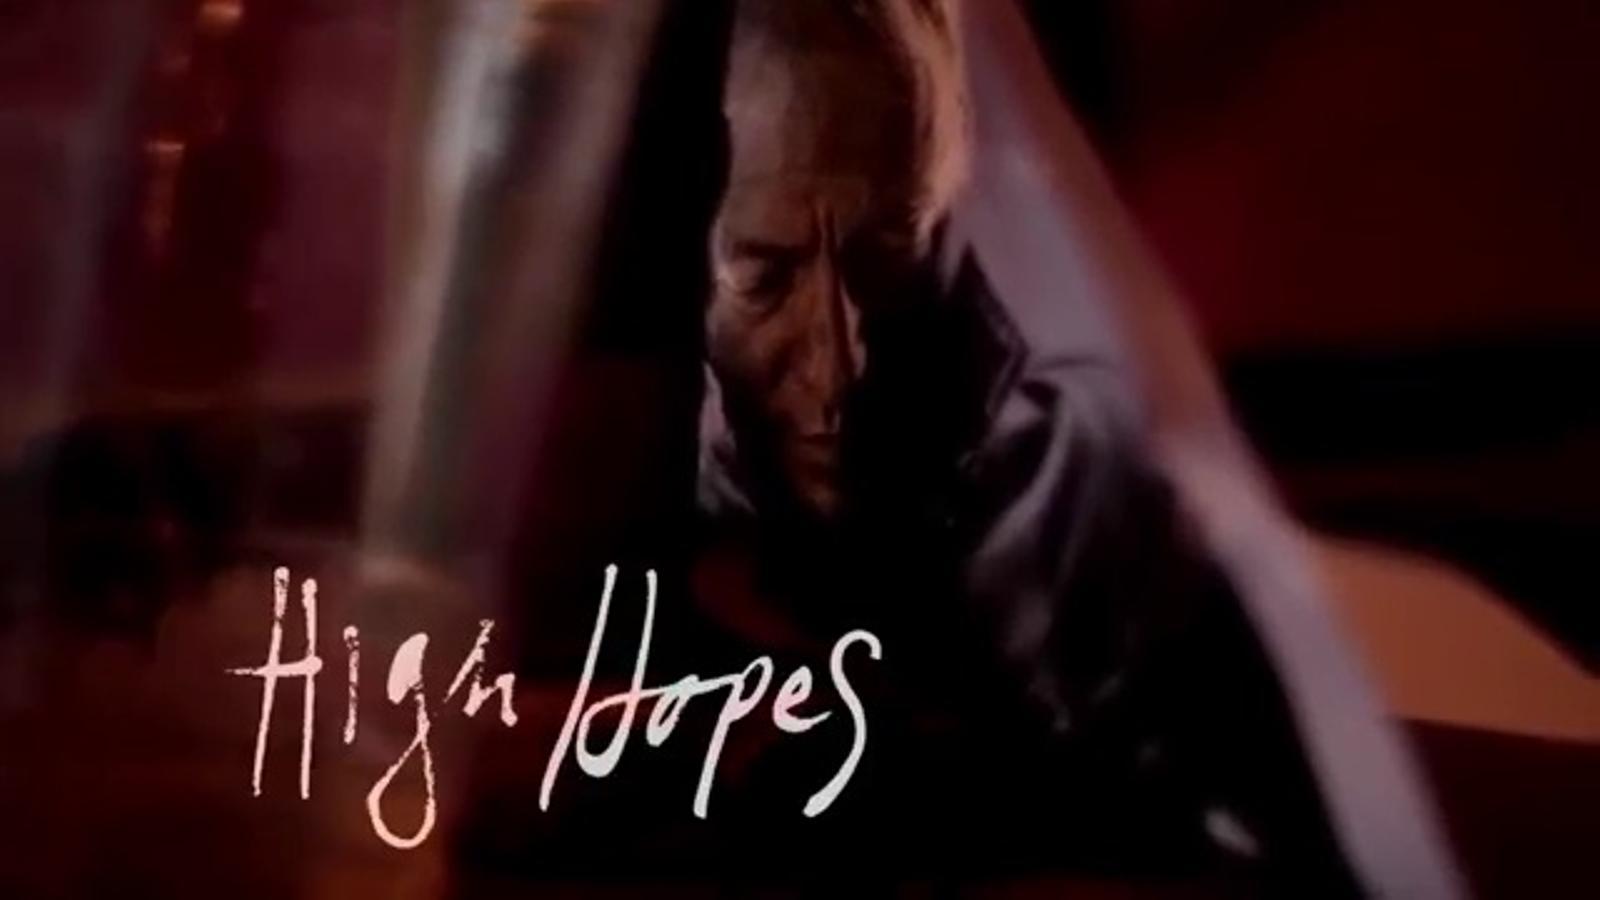 Videoclip de 'High Hopes', de Bruce Springsteen